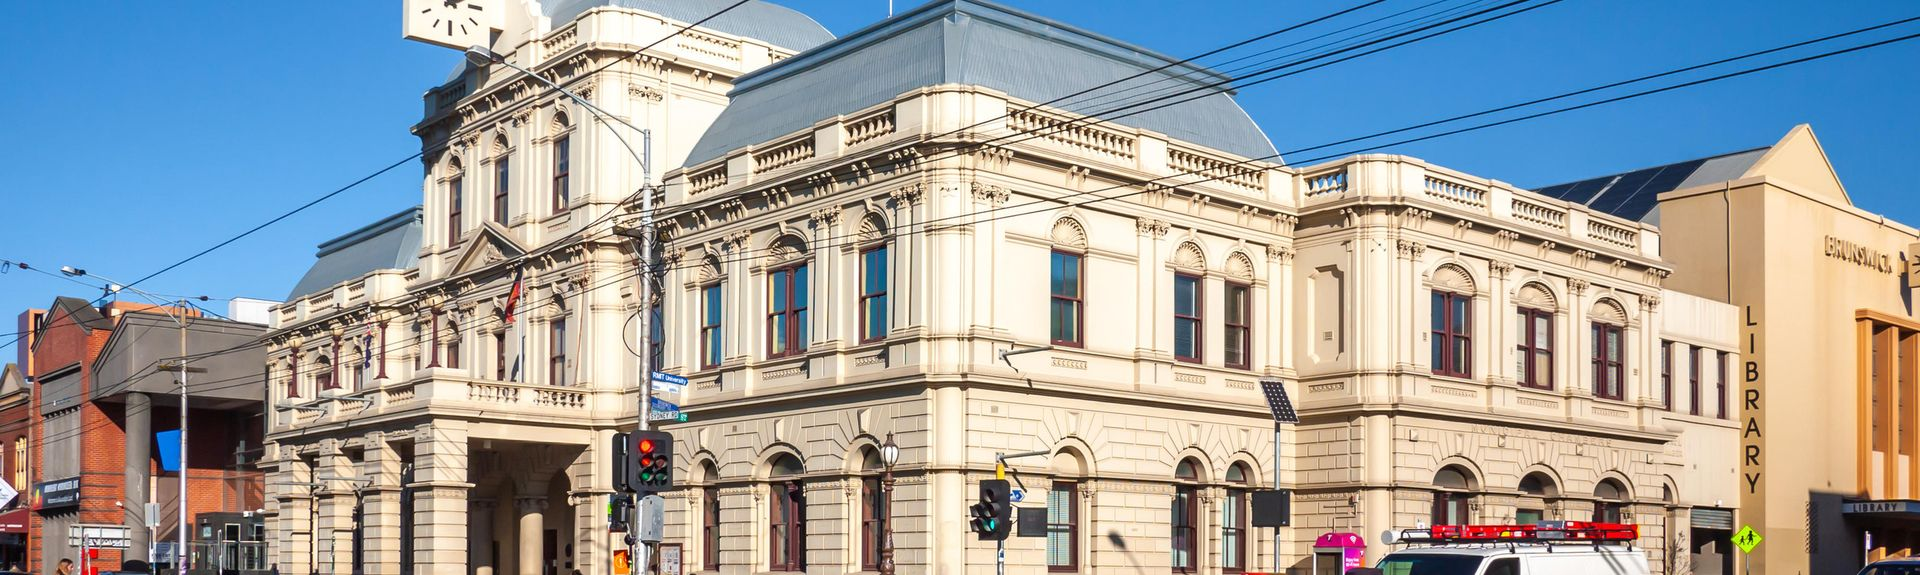 Brunswick, Victoria, Australië